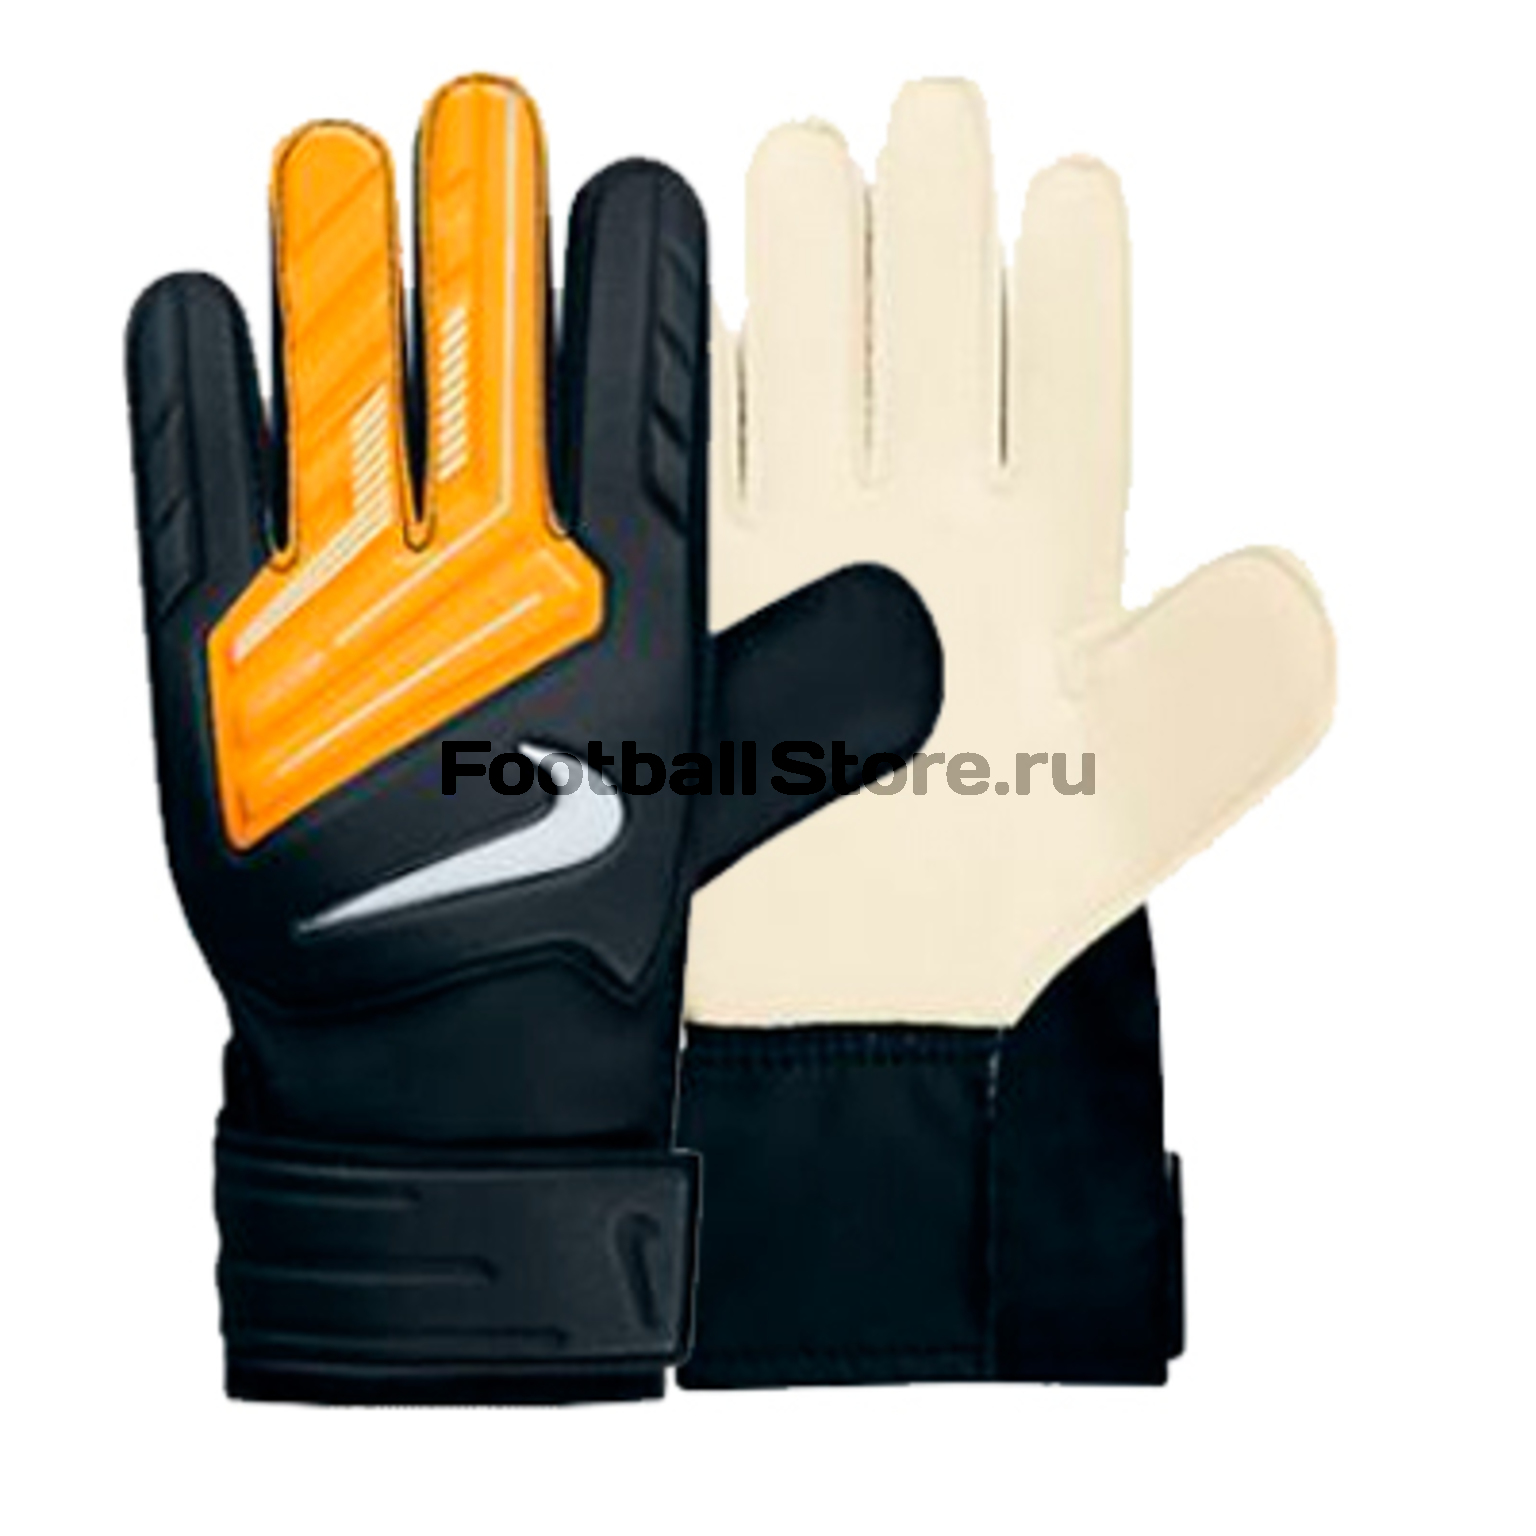 Вратарская экипировка Nike Вратарские перчатки Nike gk jr match gs0259-081